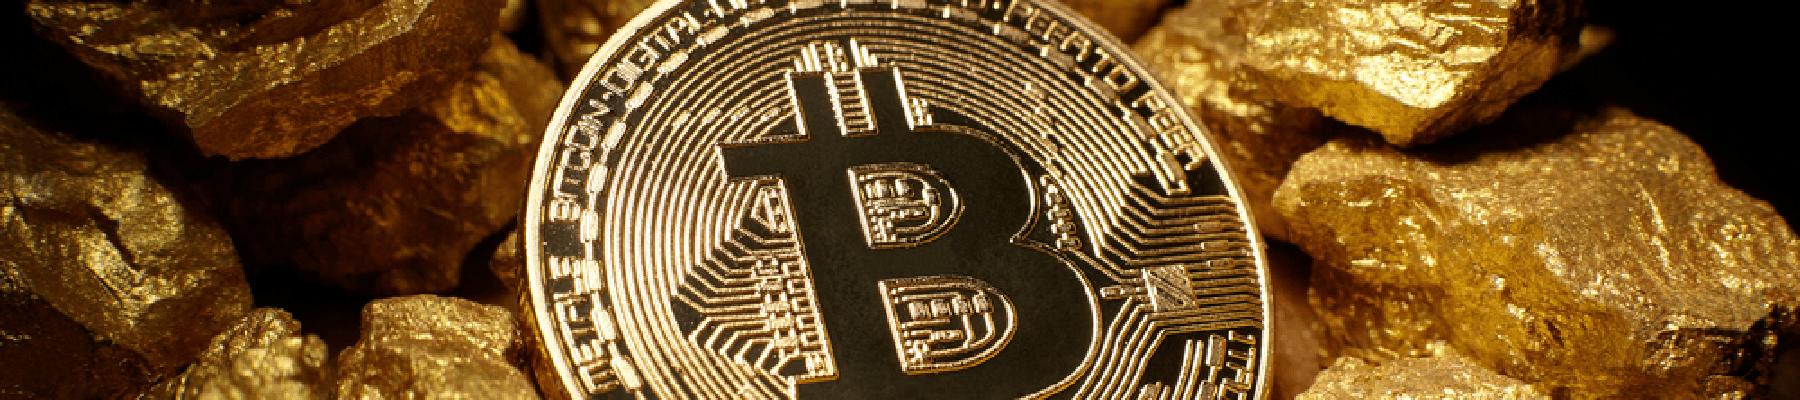 bitcoin trading image